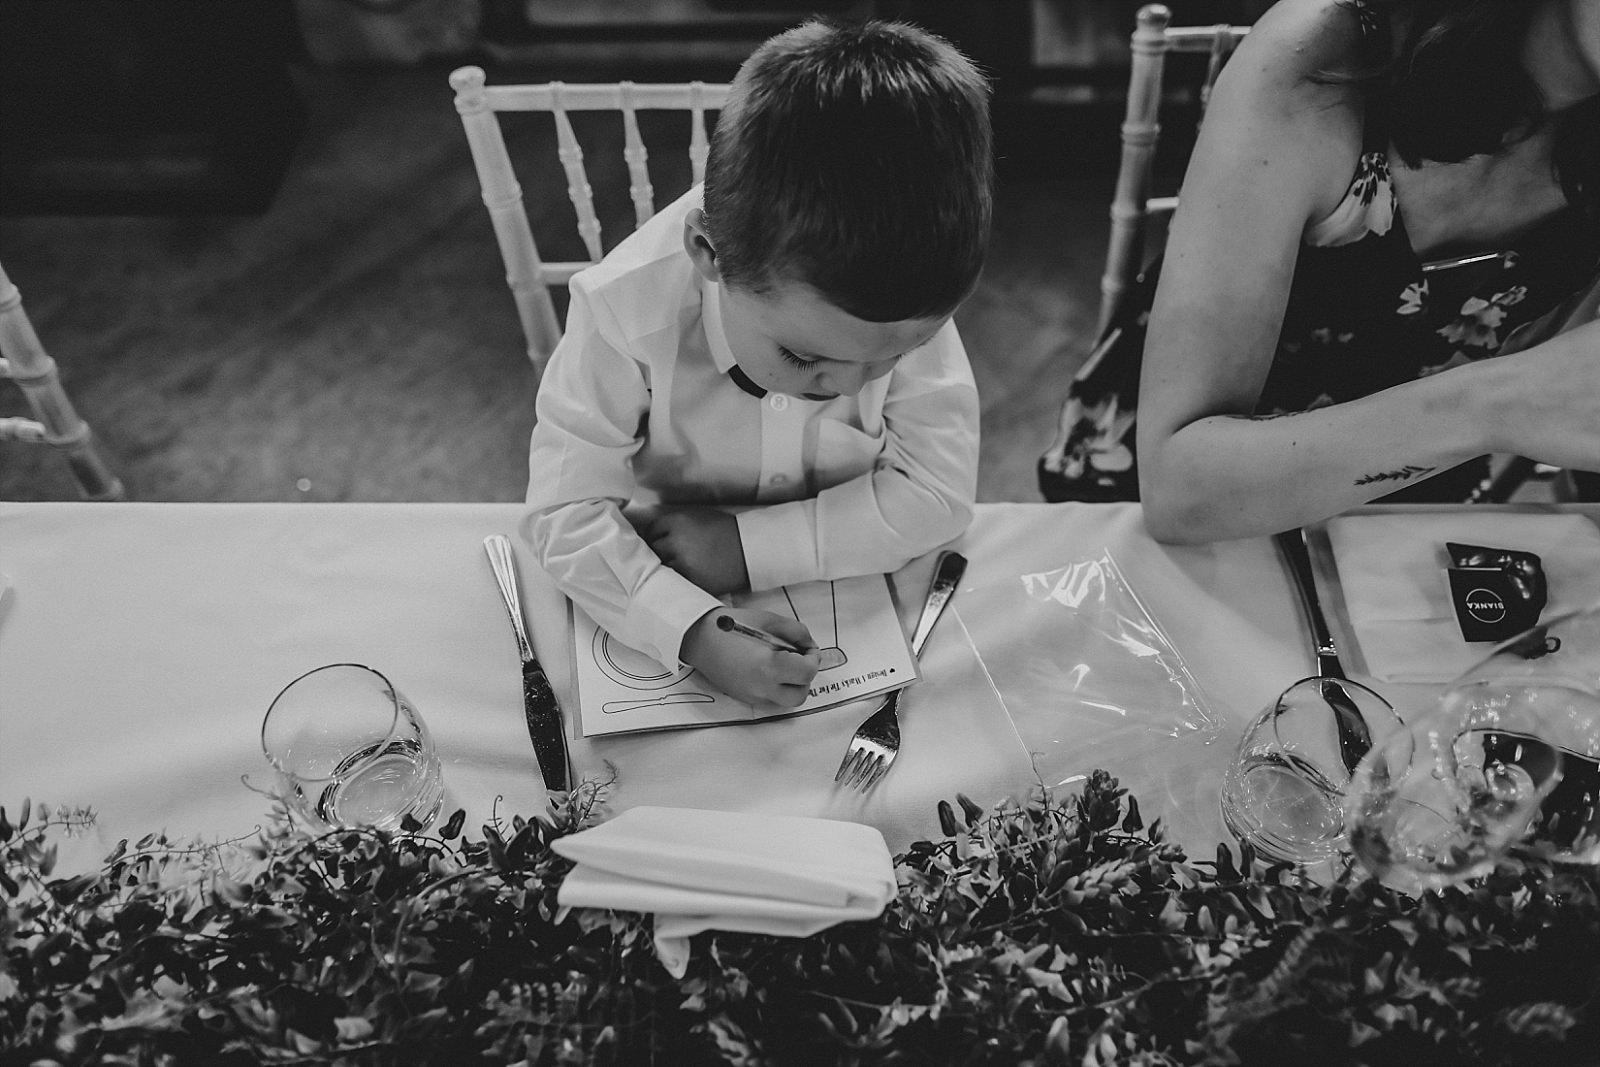 little boy colouring at a wedding